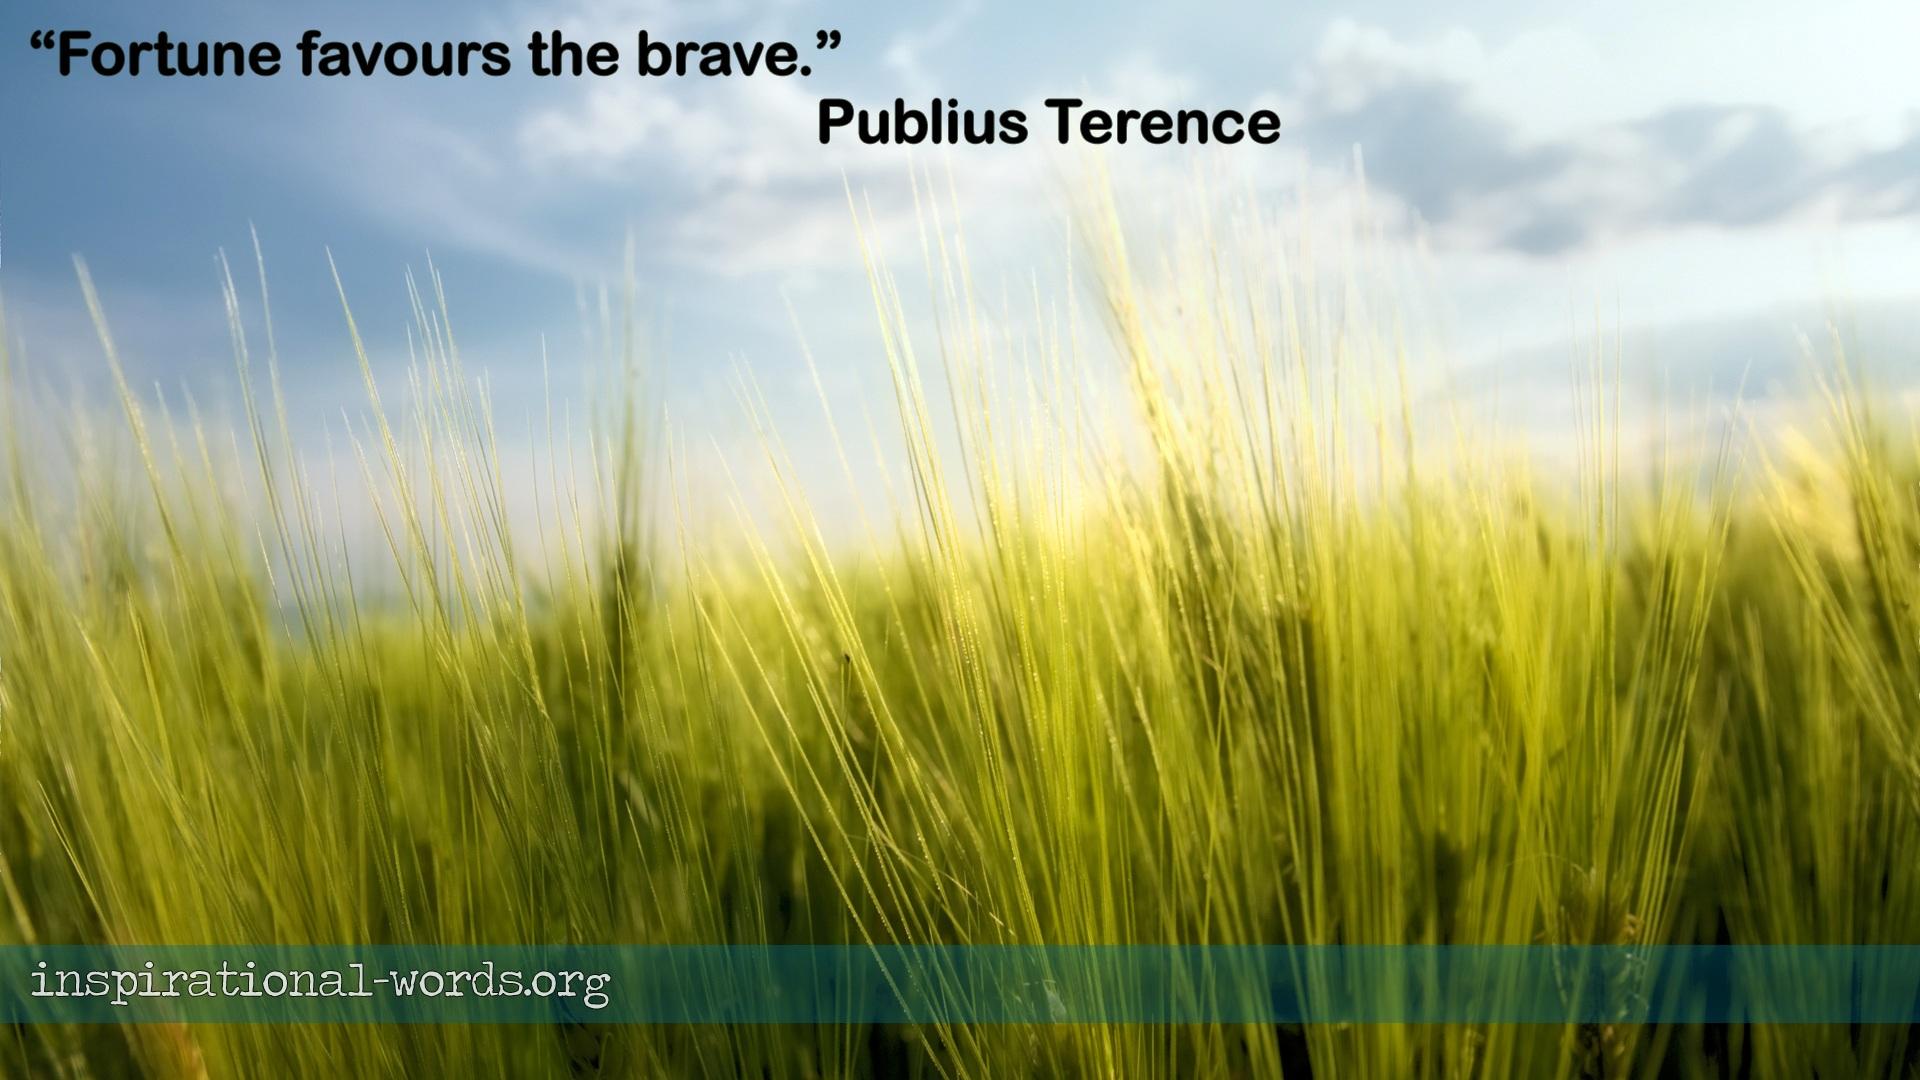 Publius Terence inspirational wallpaper